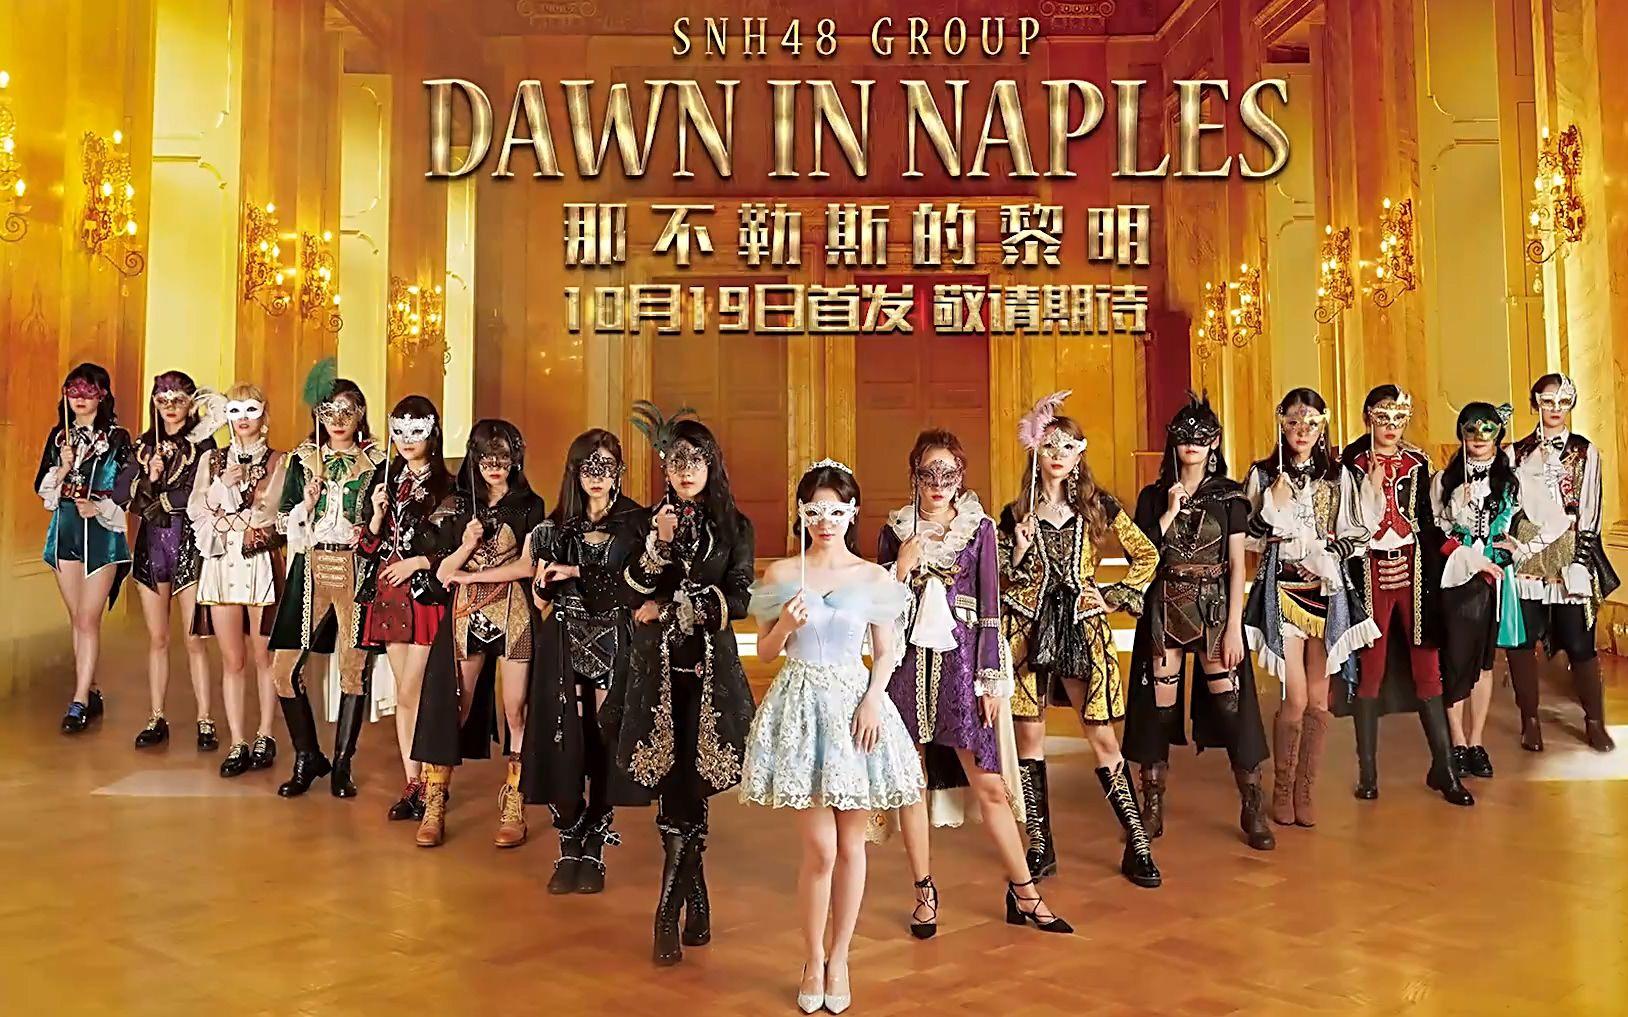 SNH48_【SNH48】《那不勒斯的黎明》MV预告 171016_明星_娱乐_bilibili_哔哩哔哩